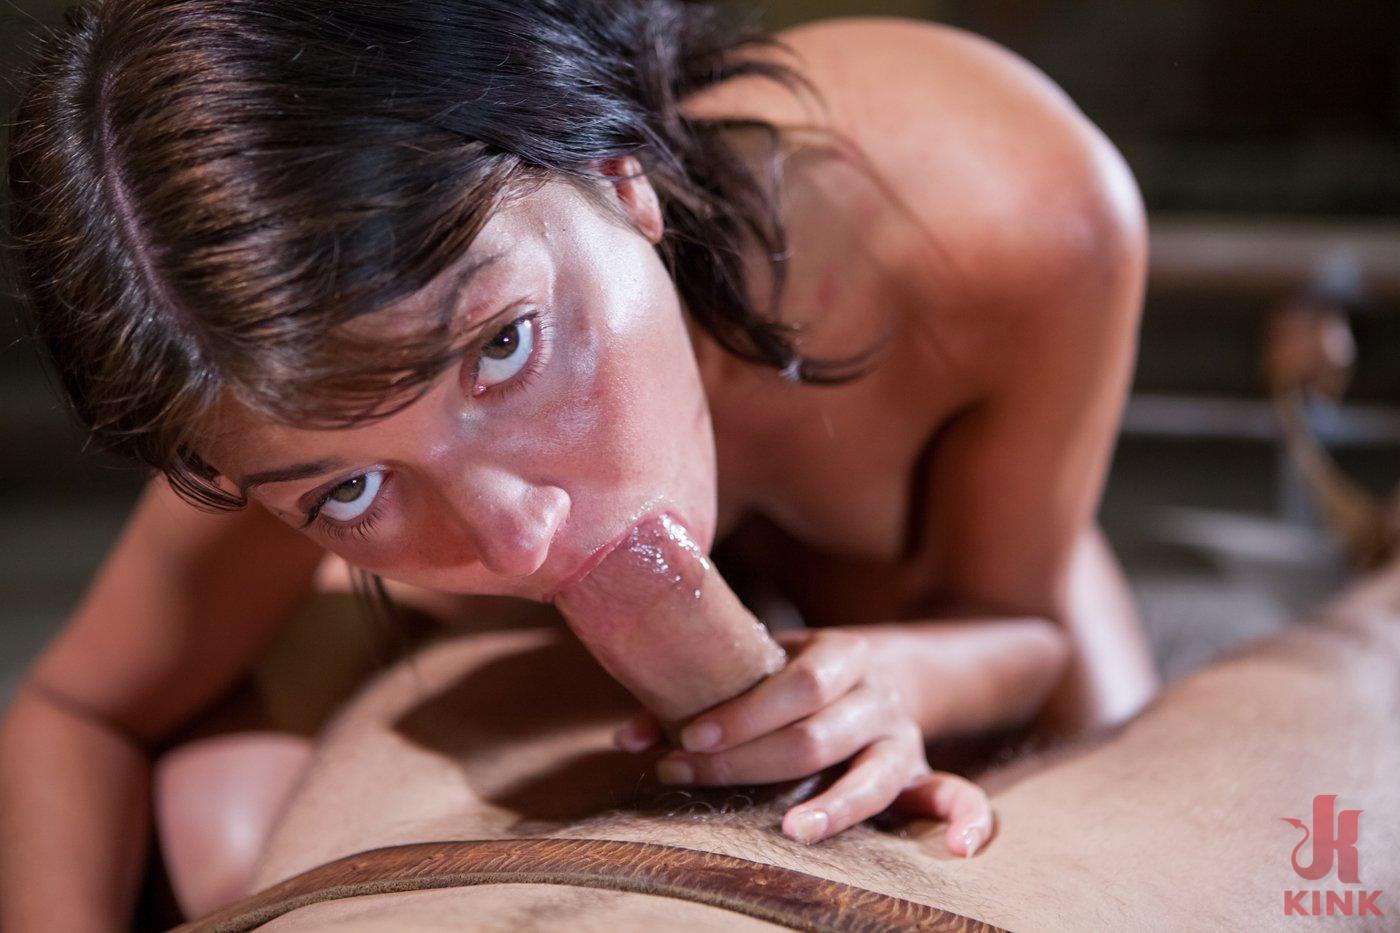 The Training of O, Hardcore BDSM Porn